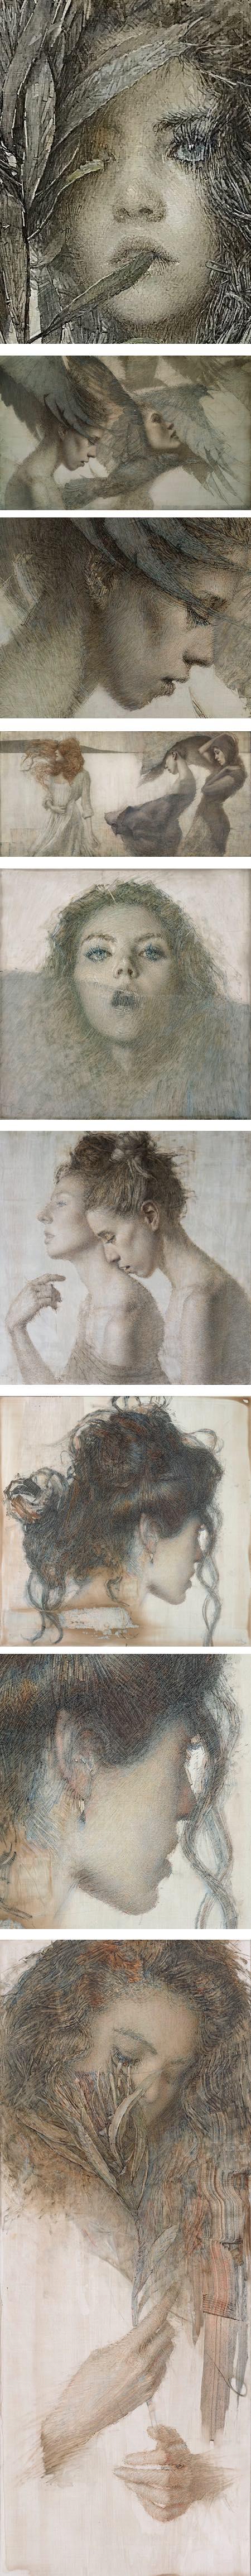 Daniel Blimes, oil paintings